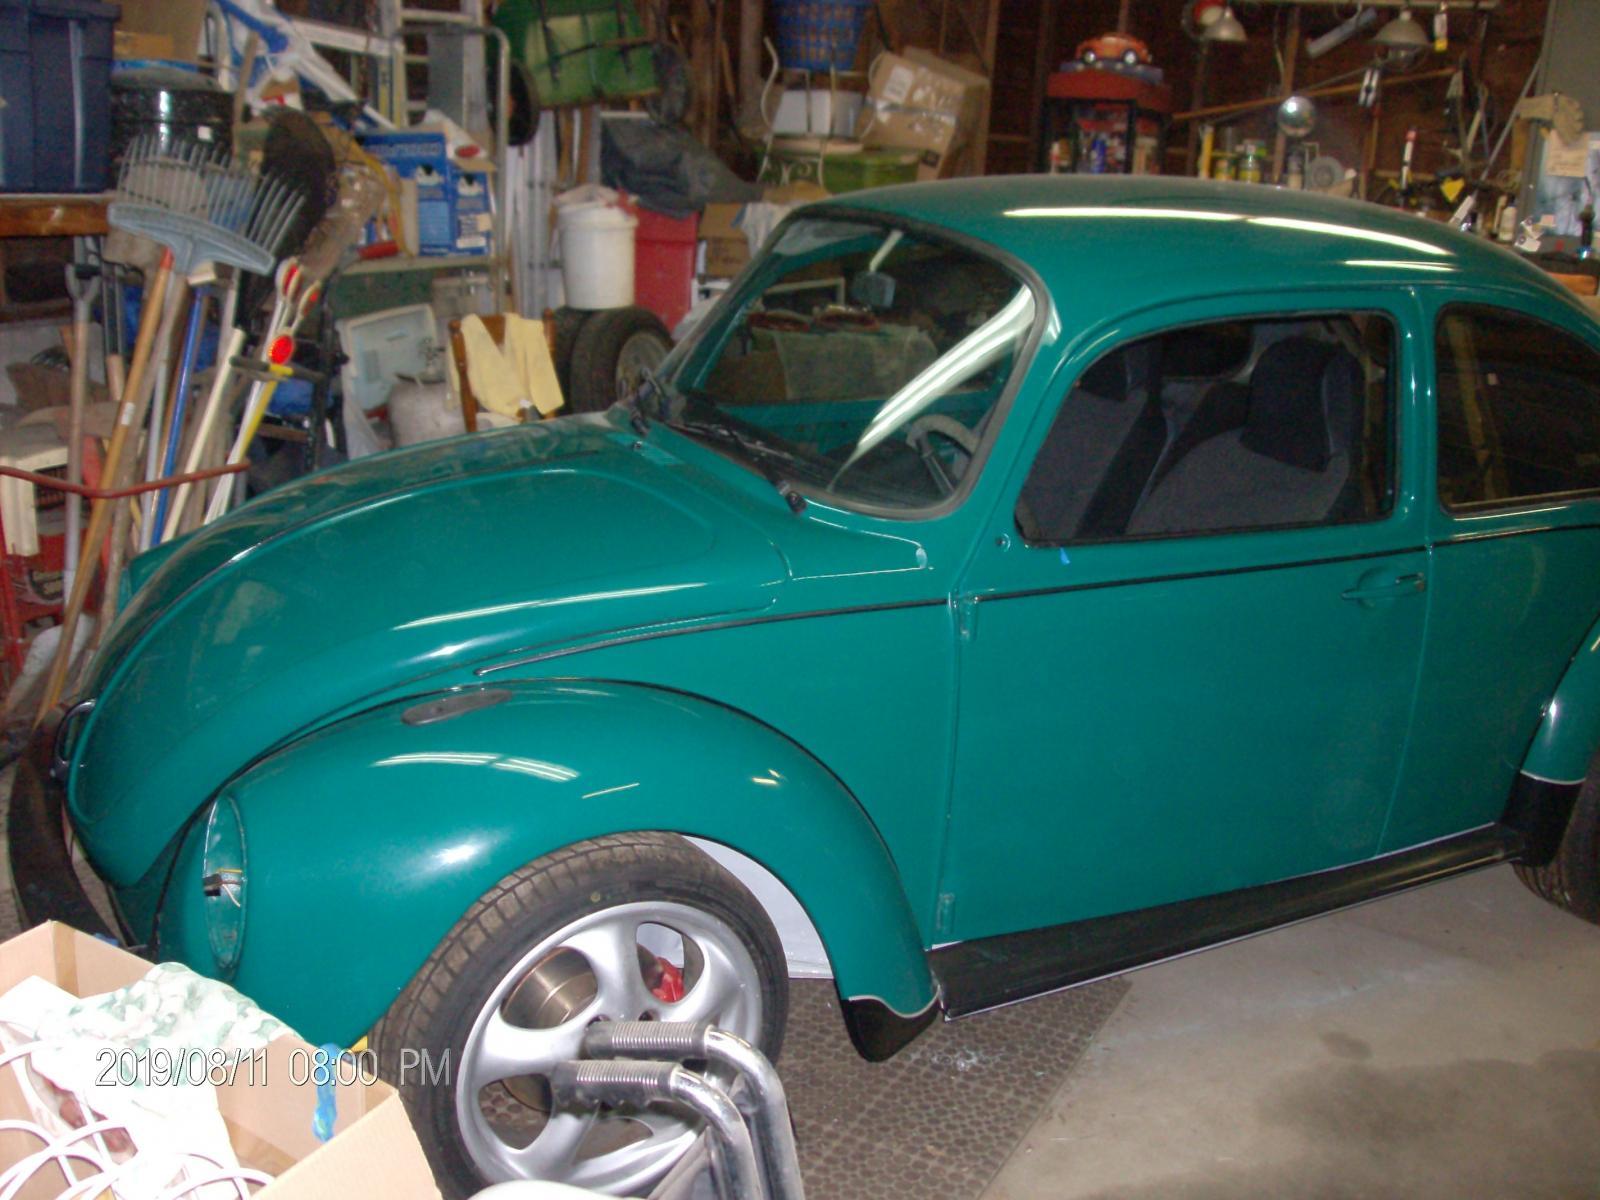 74 Super Beetle